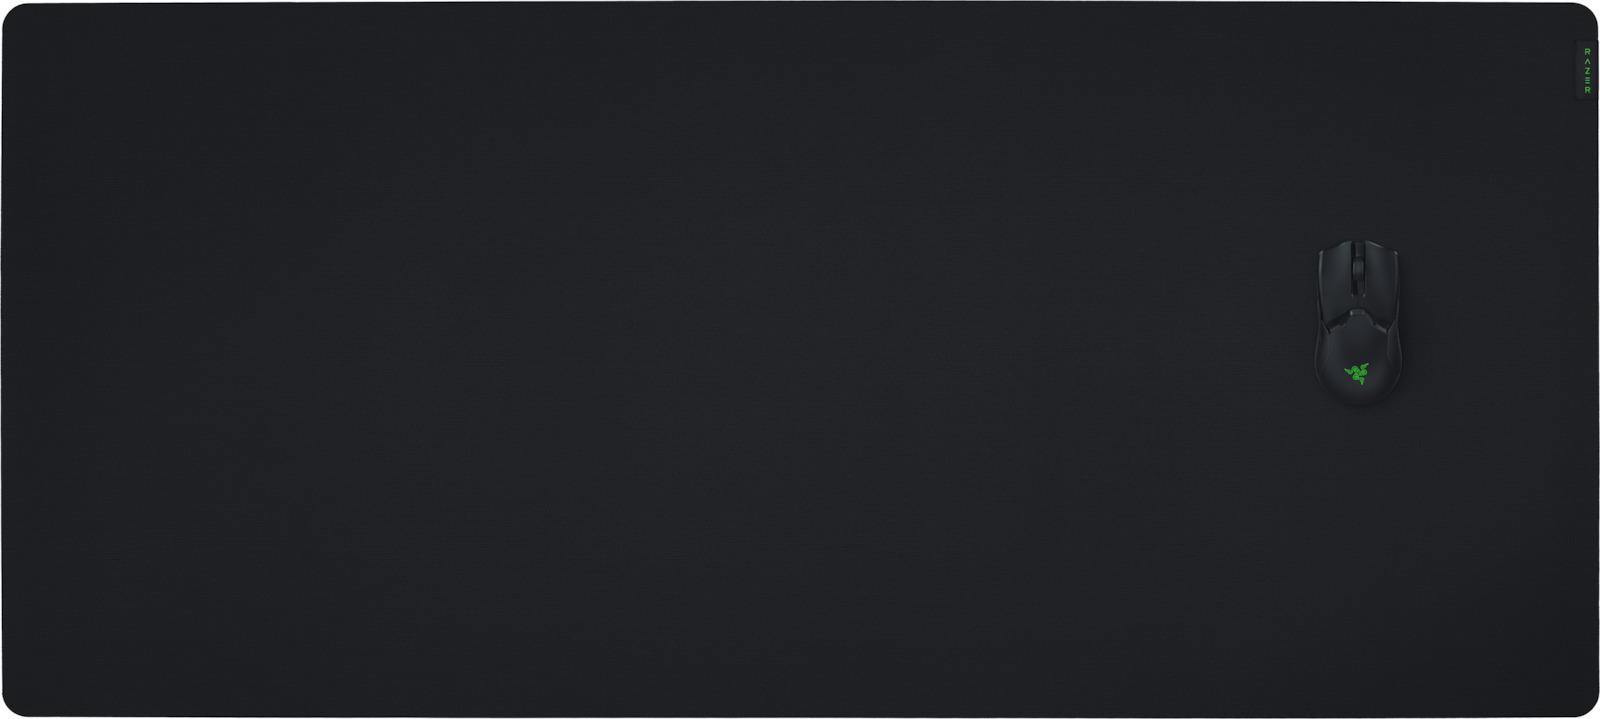 Razer Gigantus V2 3XL (RZ02-03330500-R3M1) - Πληρωμή και σε έως 36 Δόσεις!!!